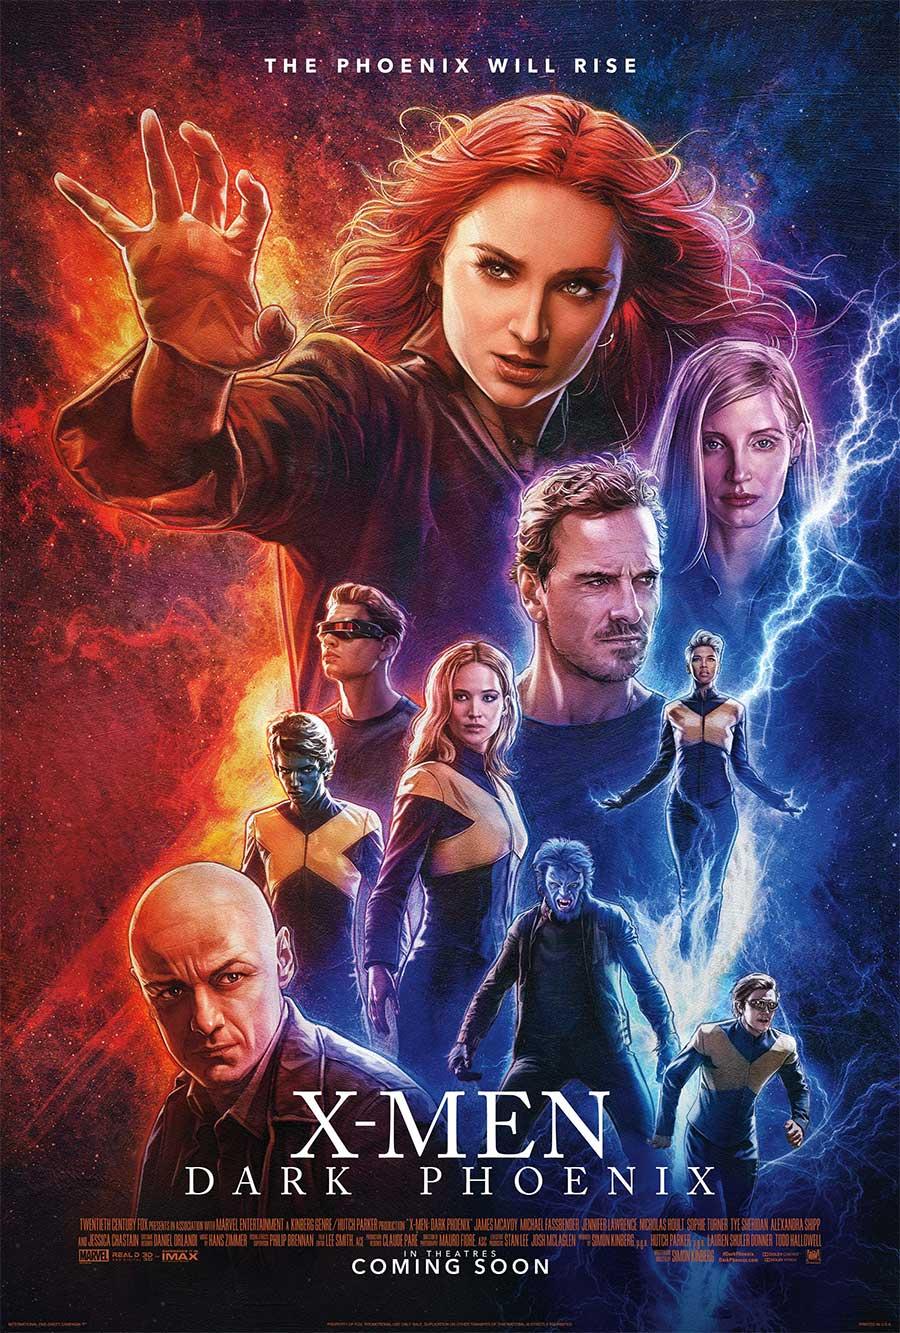 Poster for Dark Phoenix (LUX)